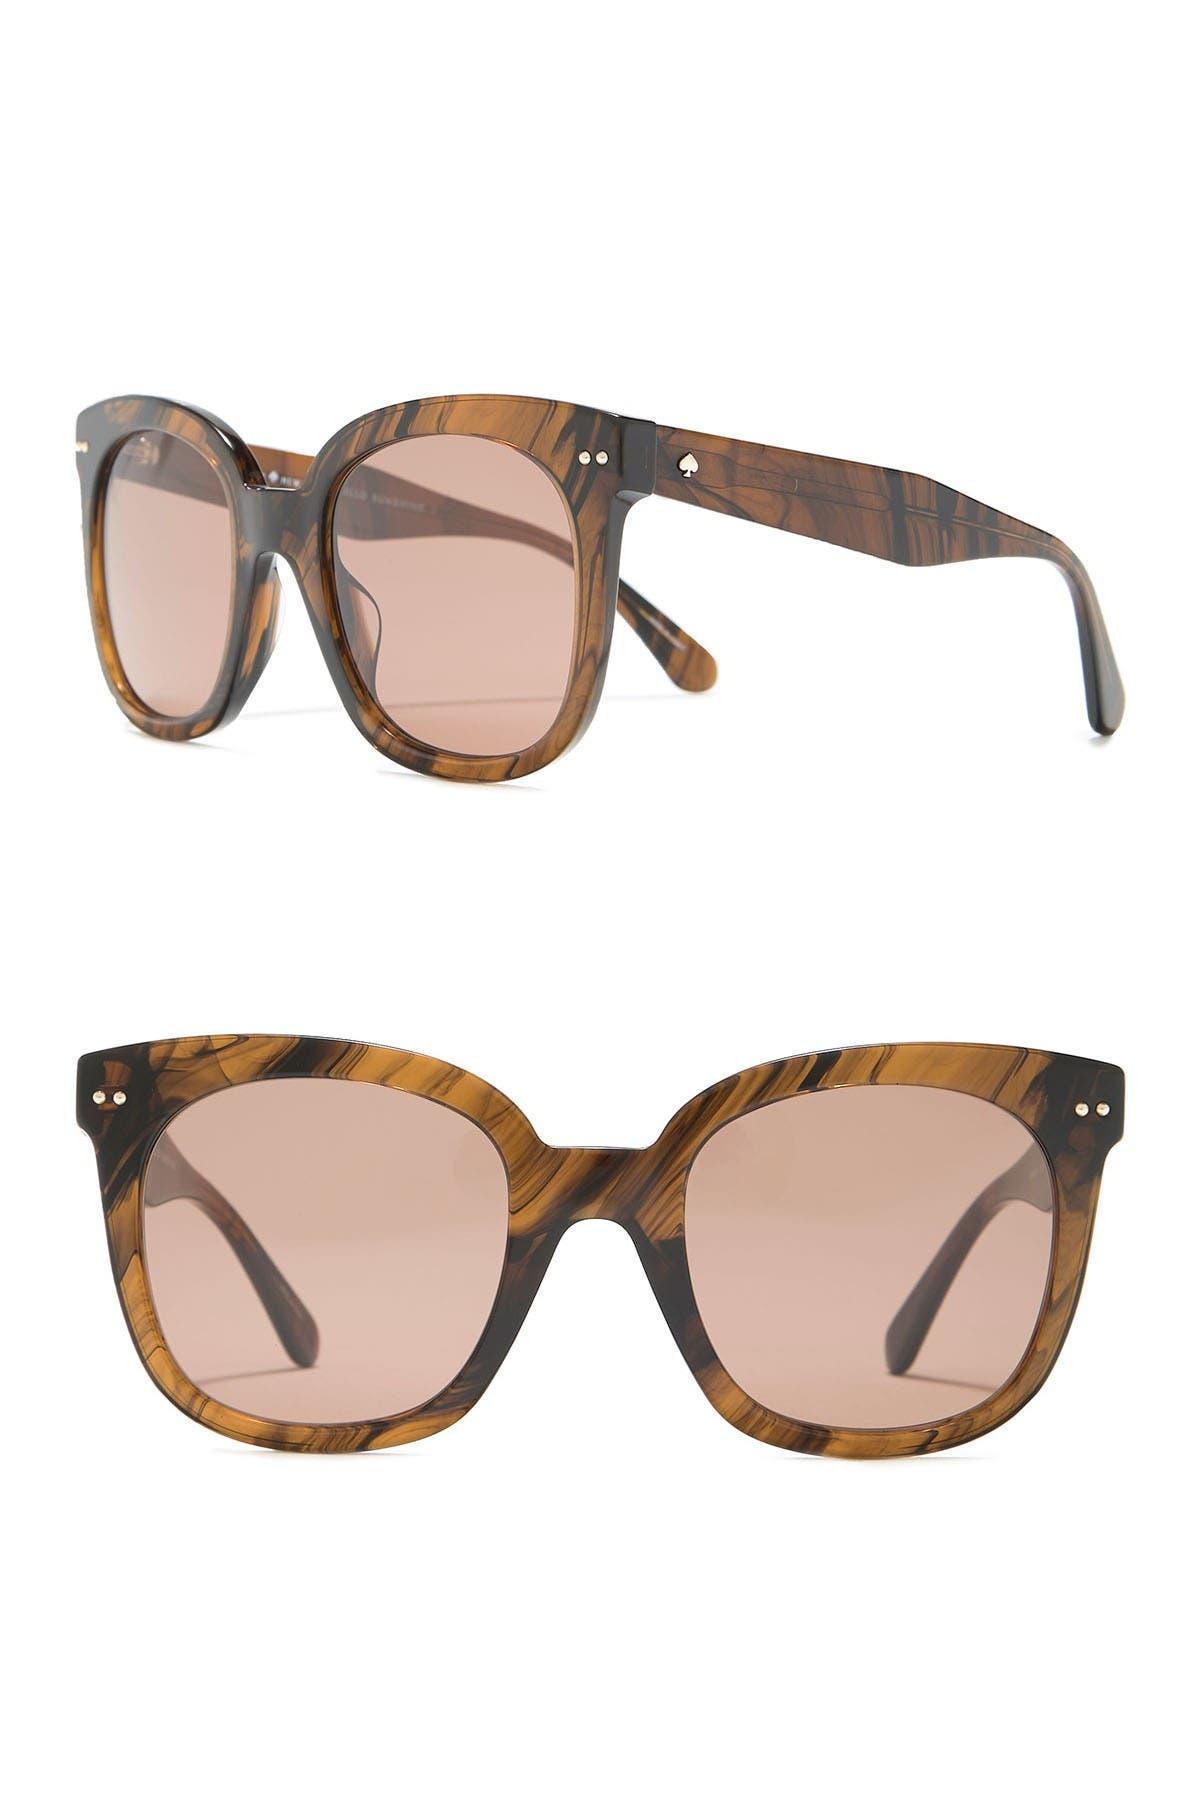 Image of kate spade new york atalia 52mm oversized square sunglasses